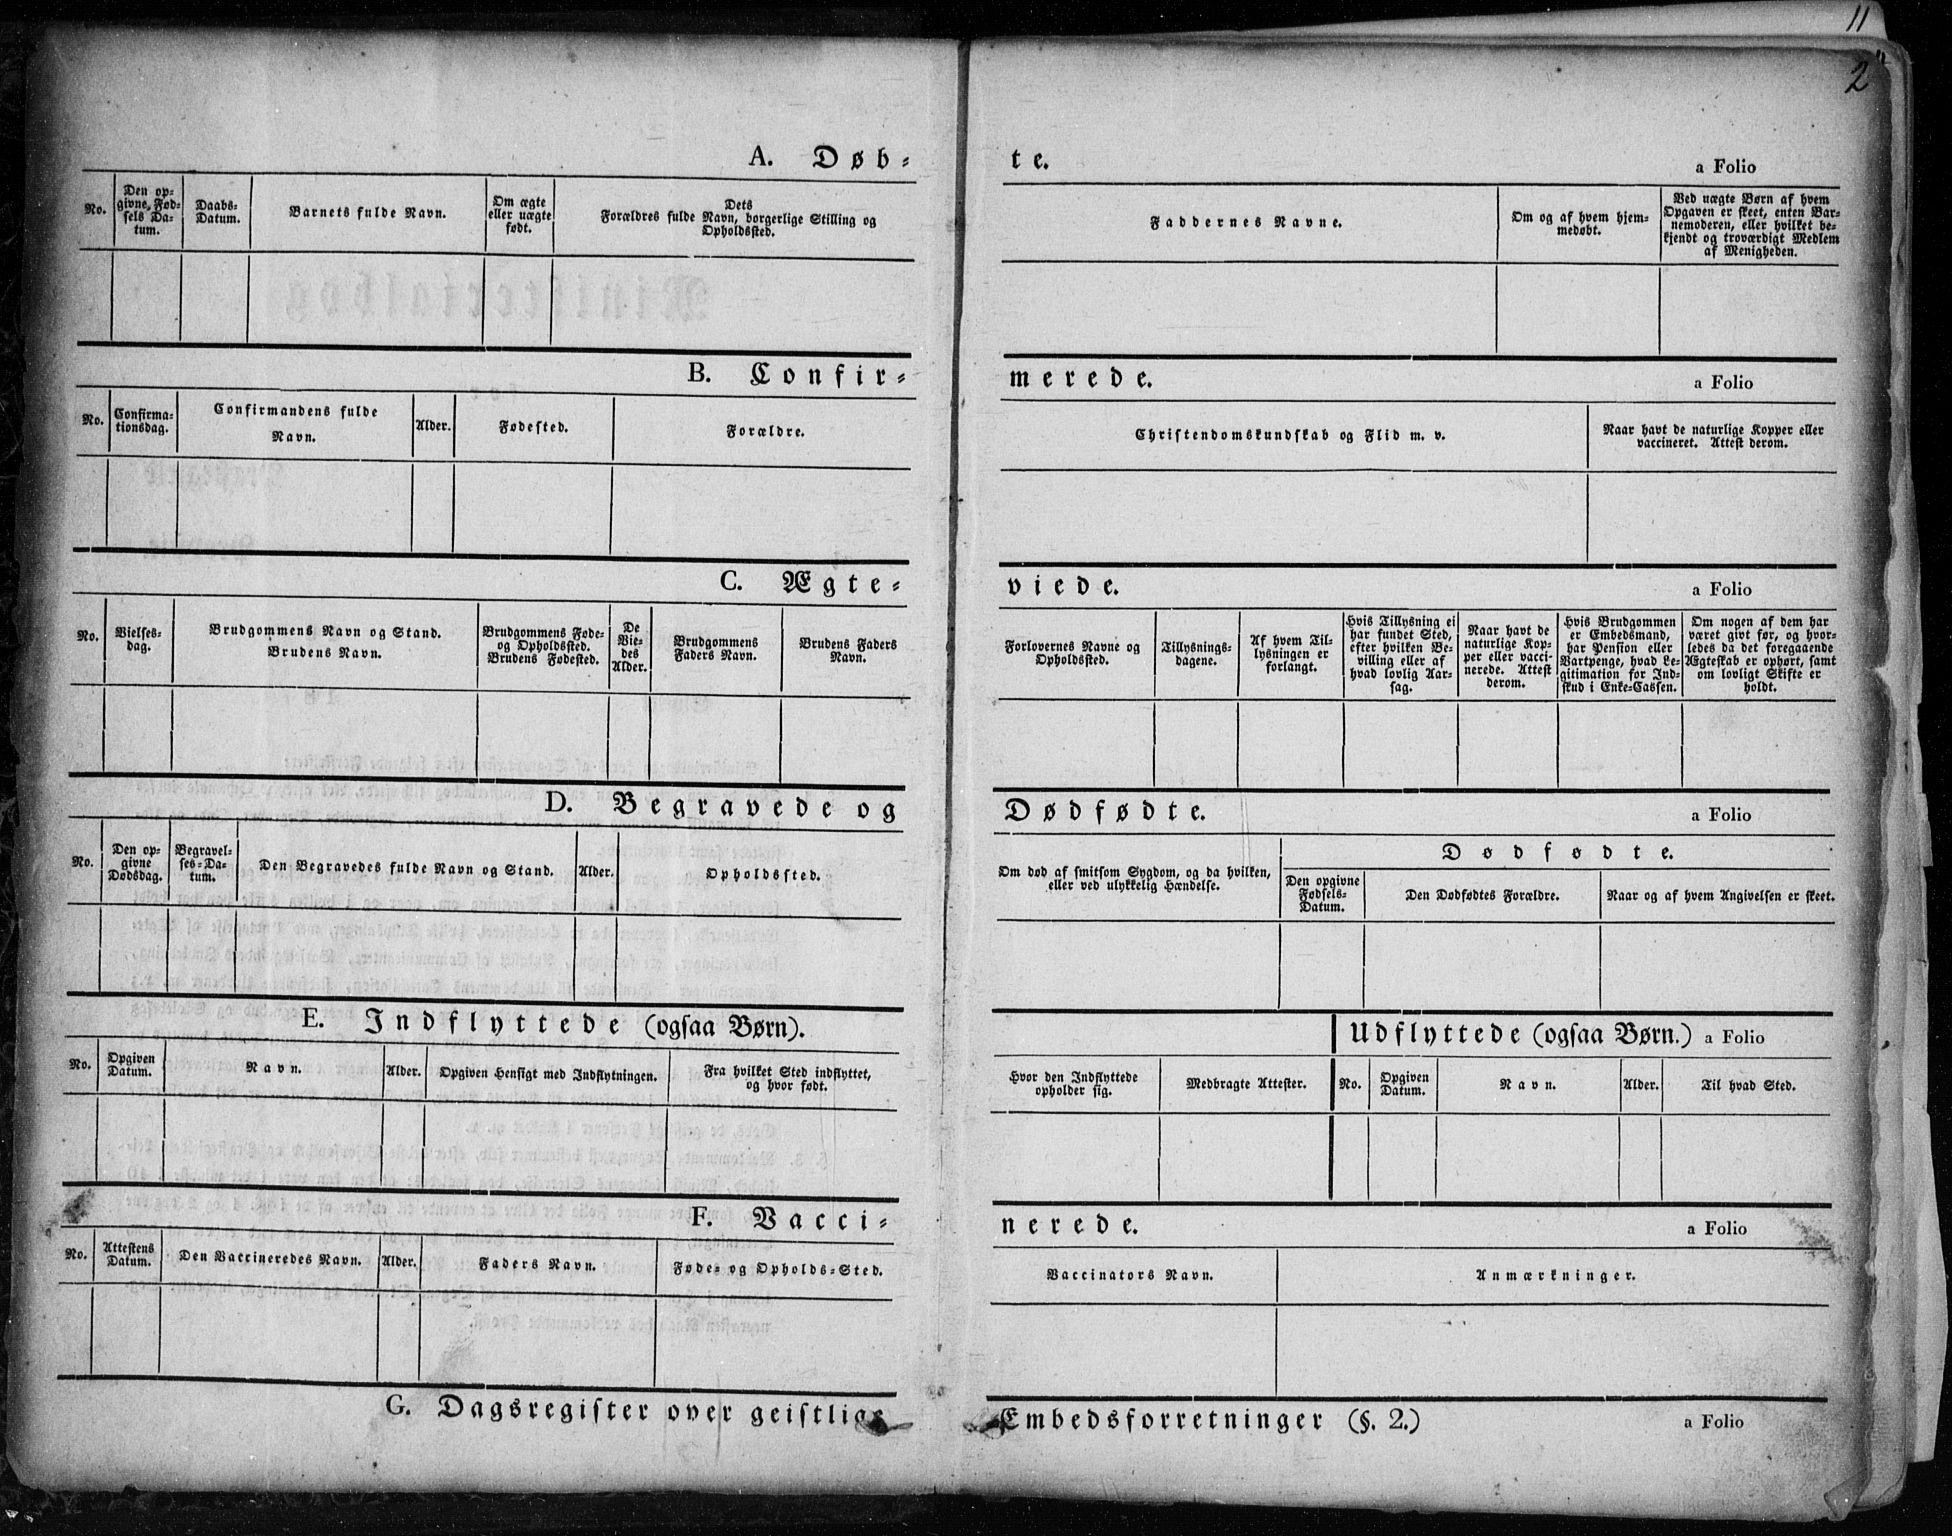 SAKO, Holla kirkebøker, F/Fa/L0005: Ministerialbok nr. 5, 1849-1860, s. 2